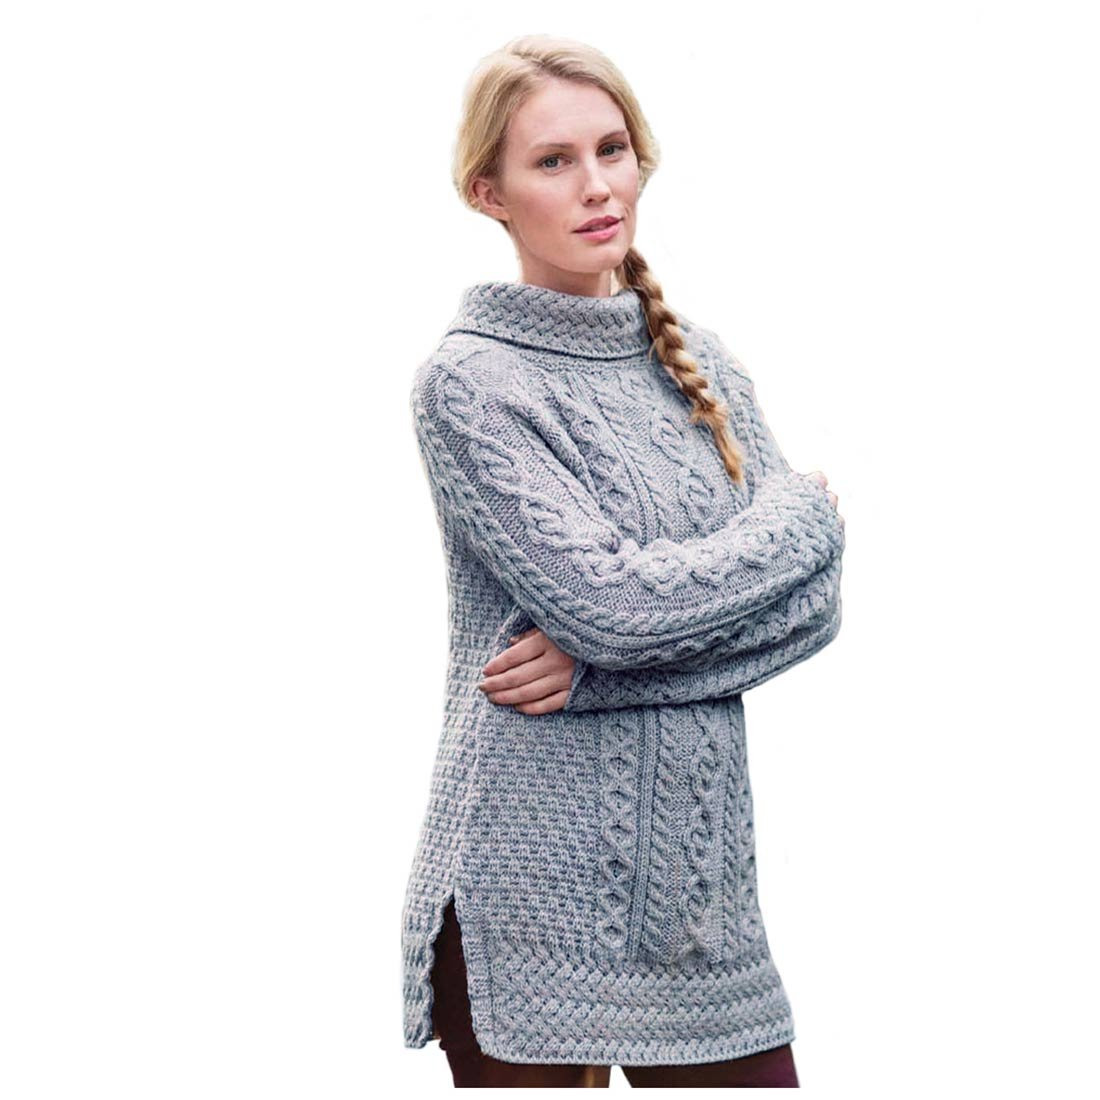 Carraig Donn Women's Long Irish Sweater Large Beige by Carraig Donn